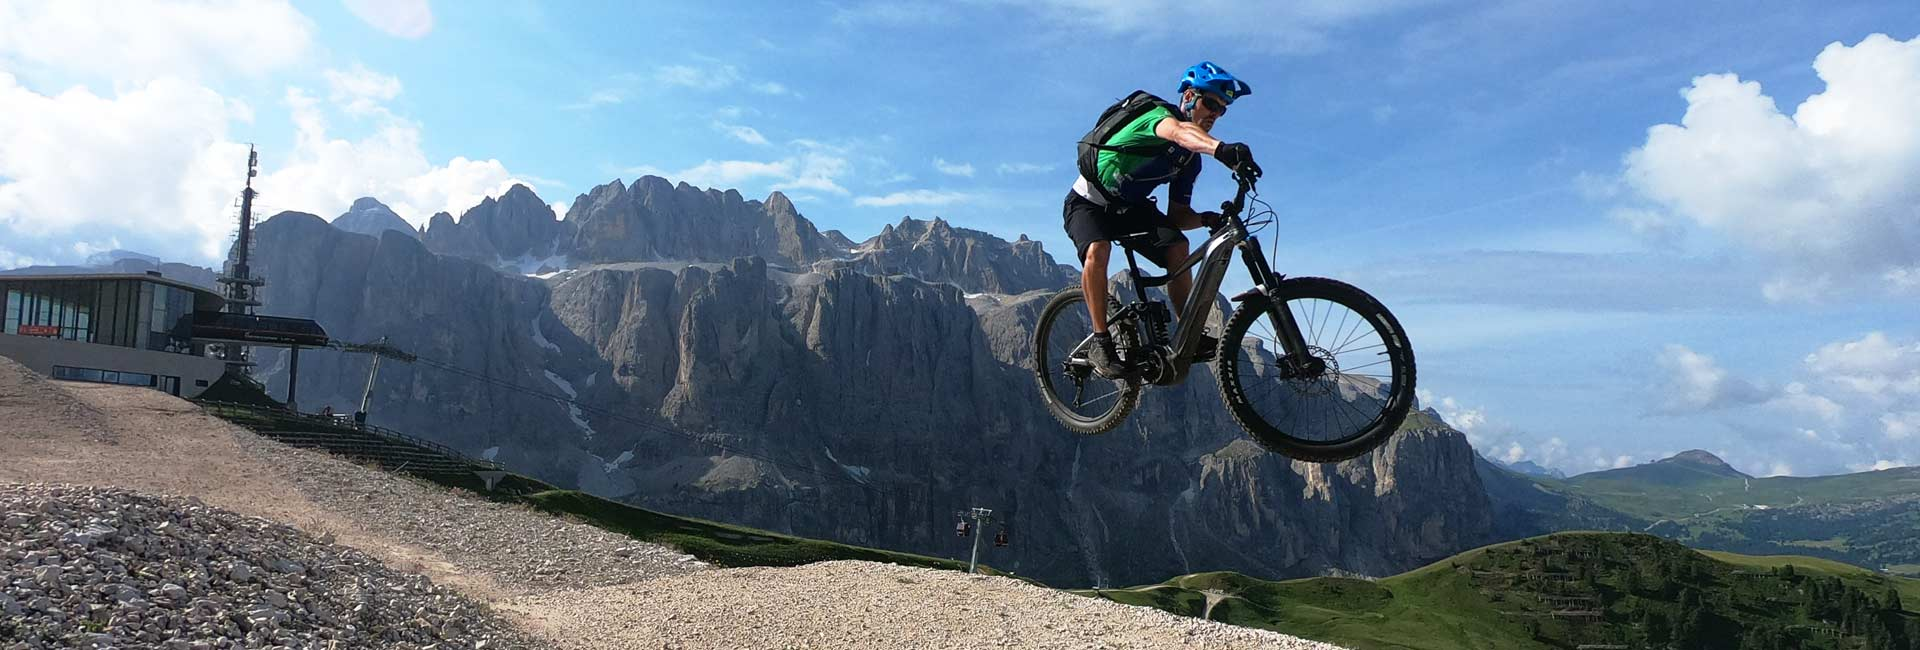 Bike arena Val Gardena - jump line dantercepies